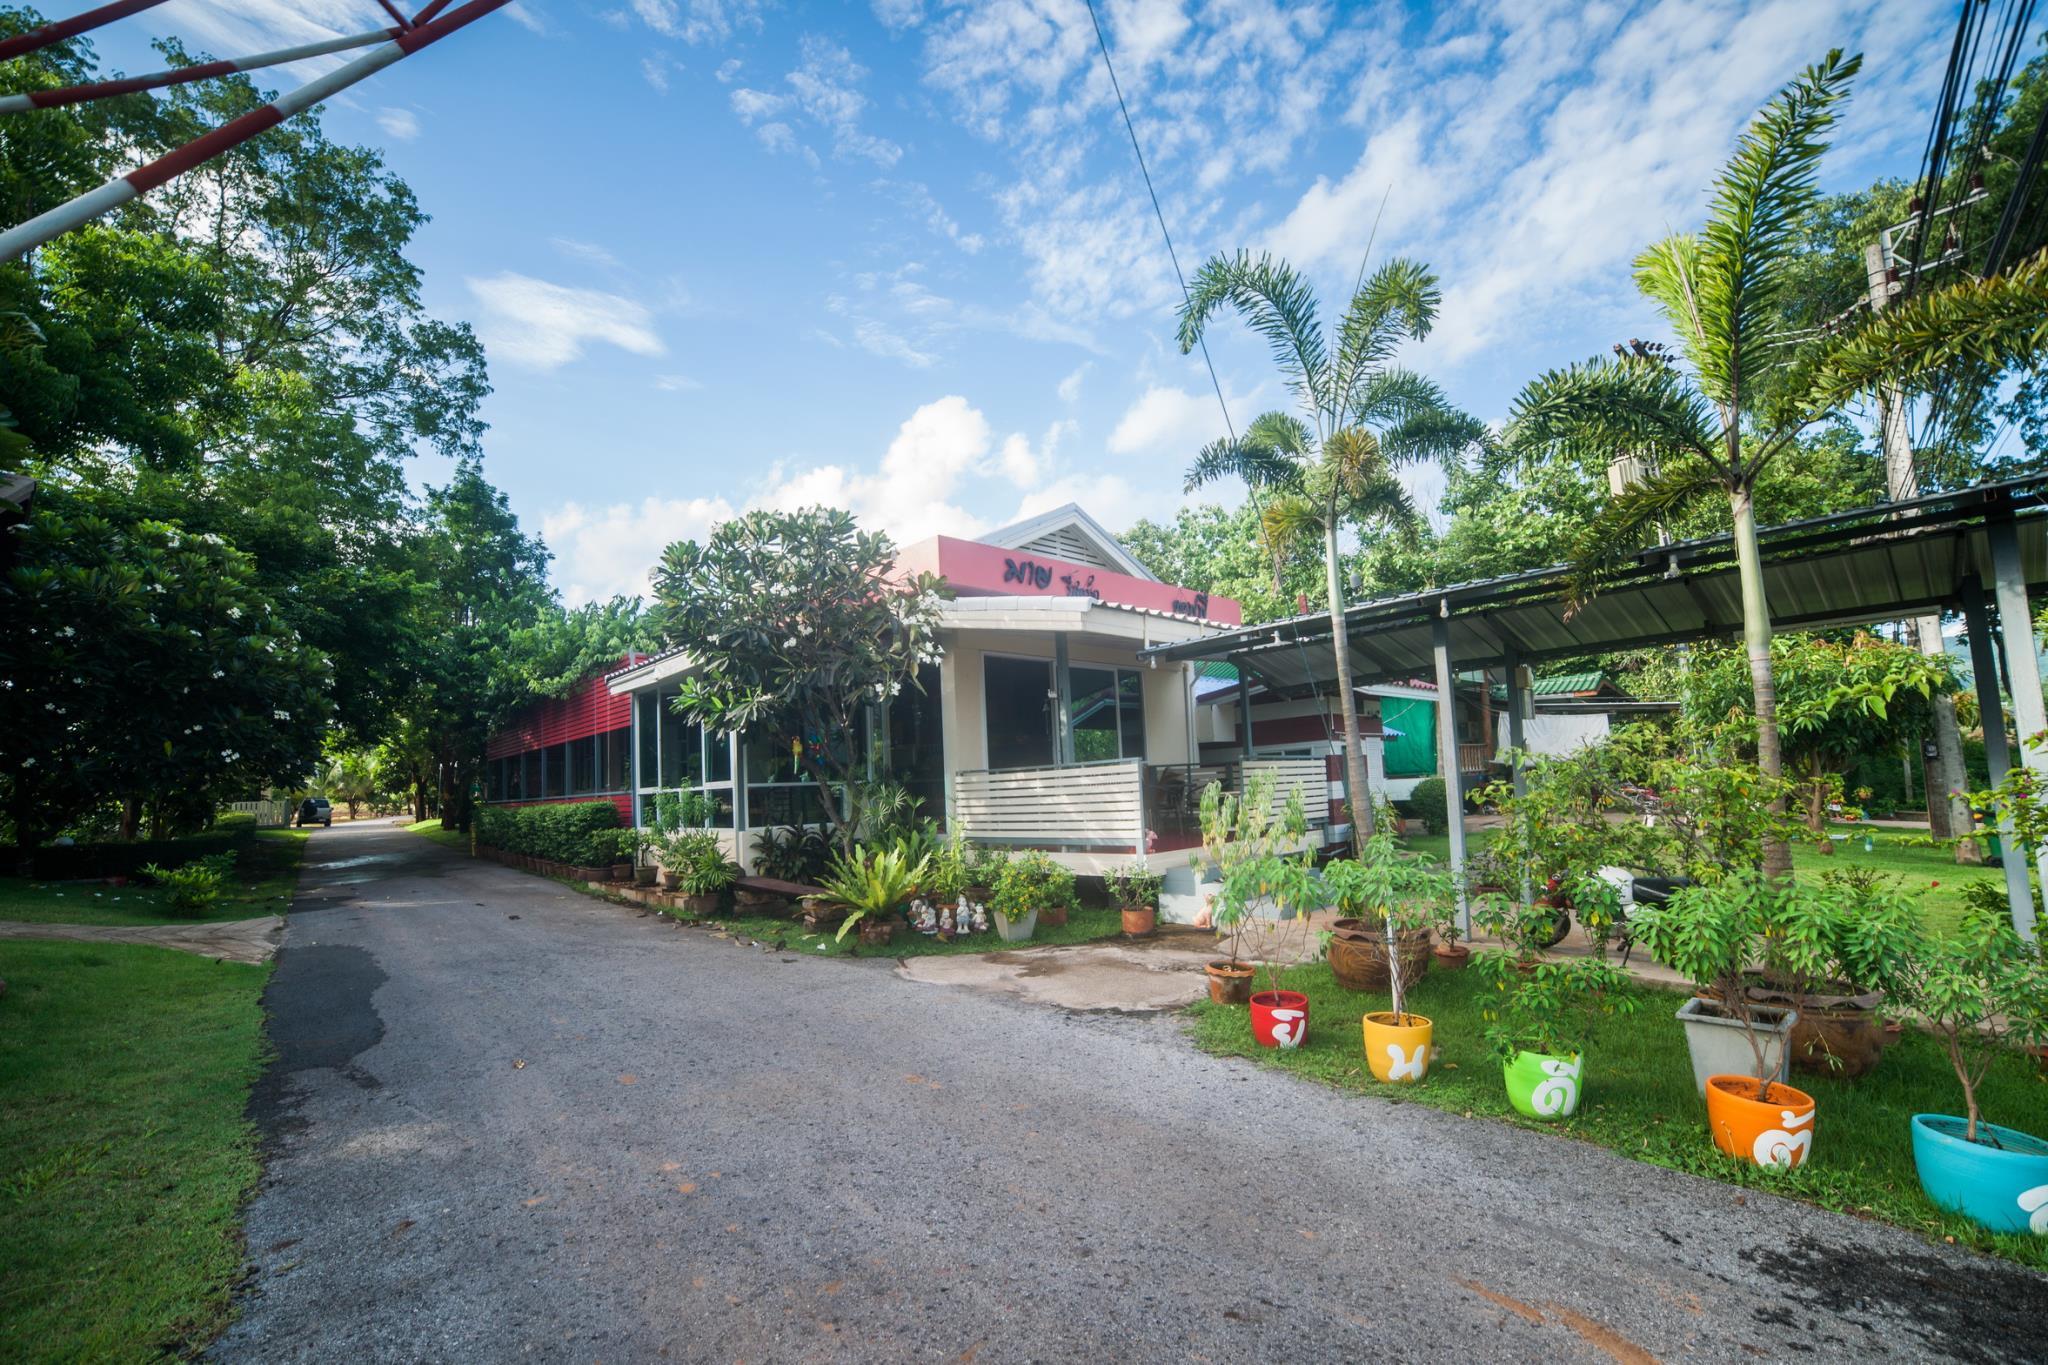 My Resort Phitsanulok,มายรีสอร์ท น้ำตกแก่งซอง